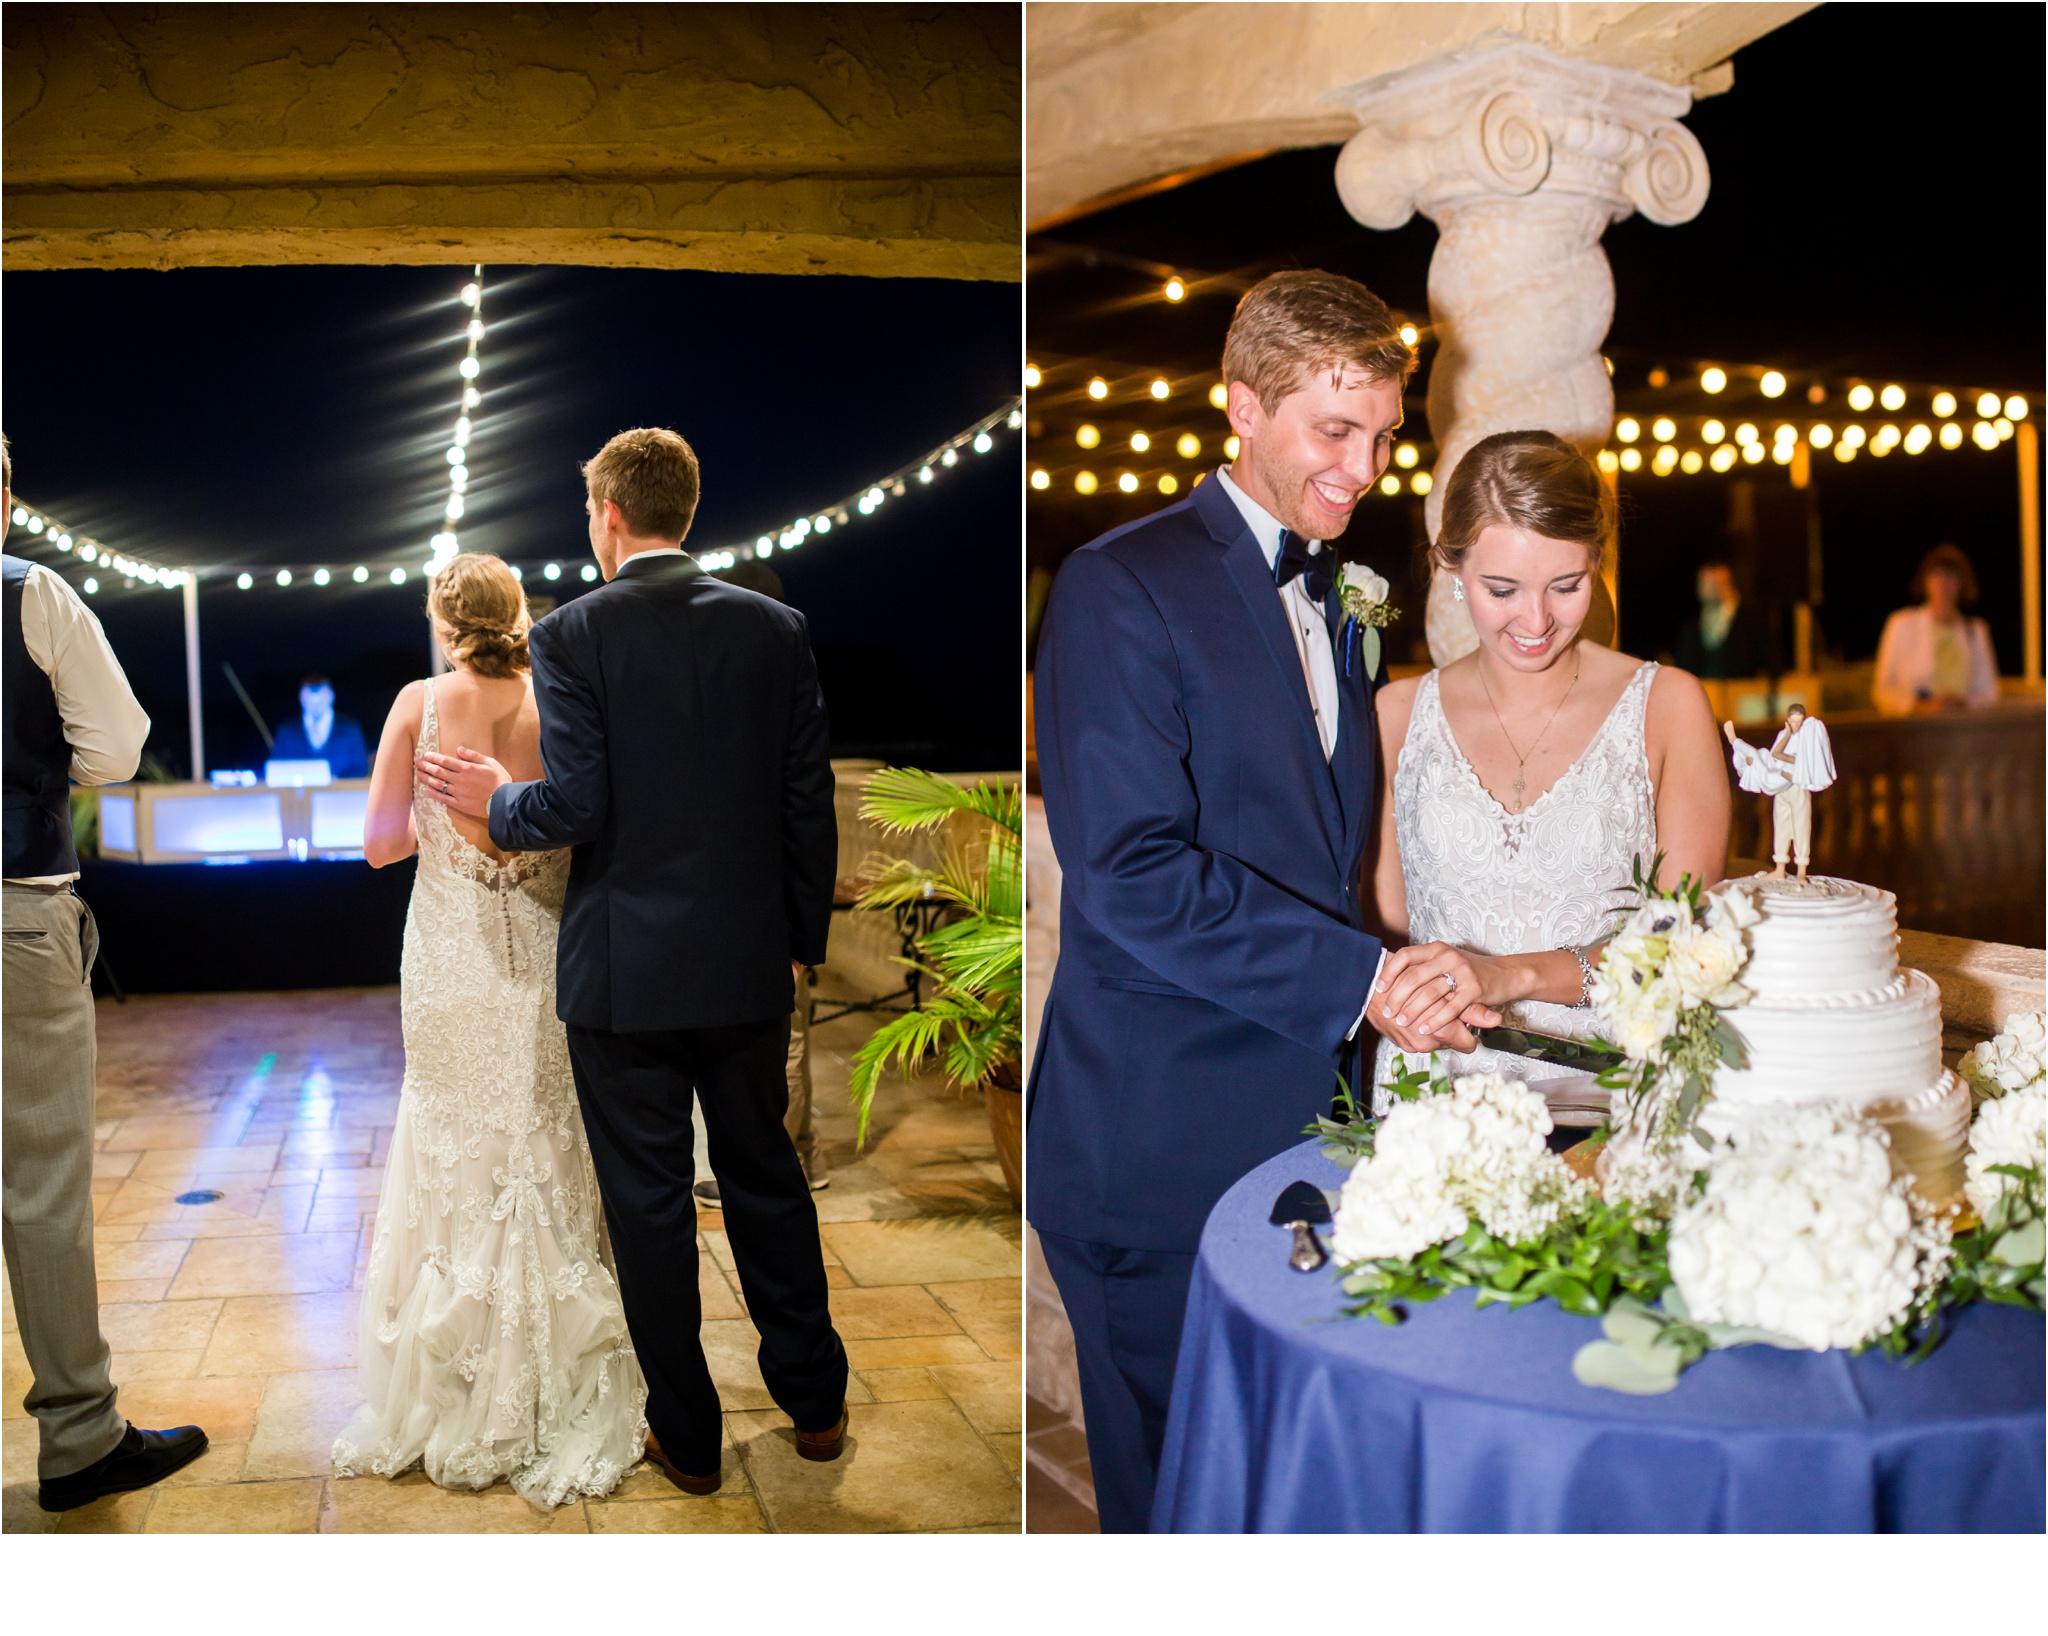 Rainey_Gregg_Photography_St._Simons_Island_Georgia_California_Wedding_Portrait_Photography_0686.jpg